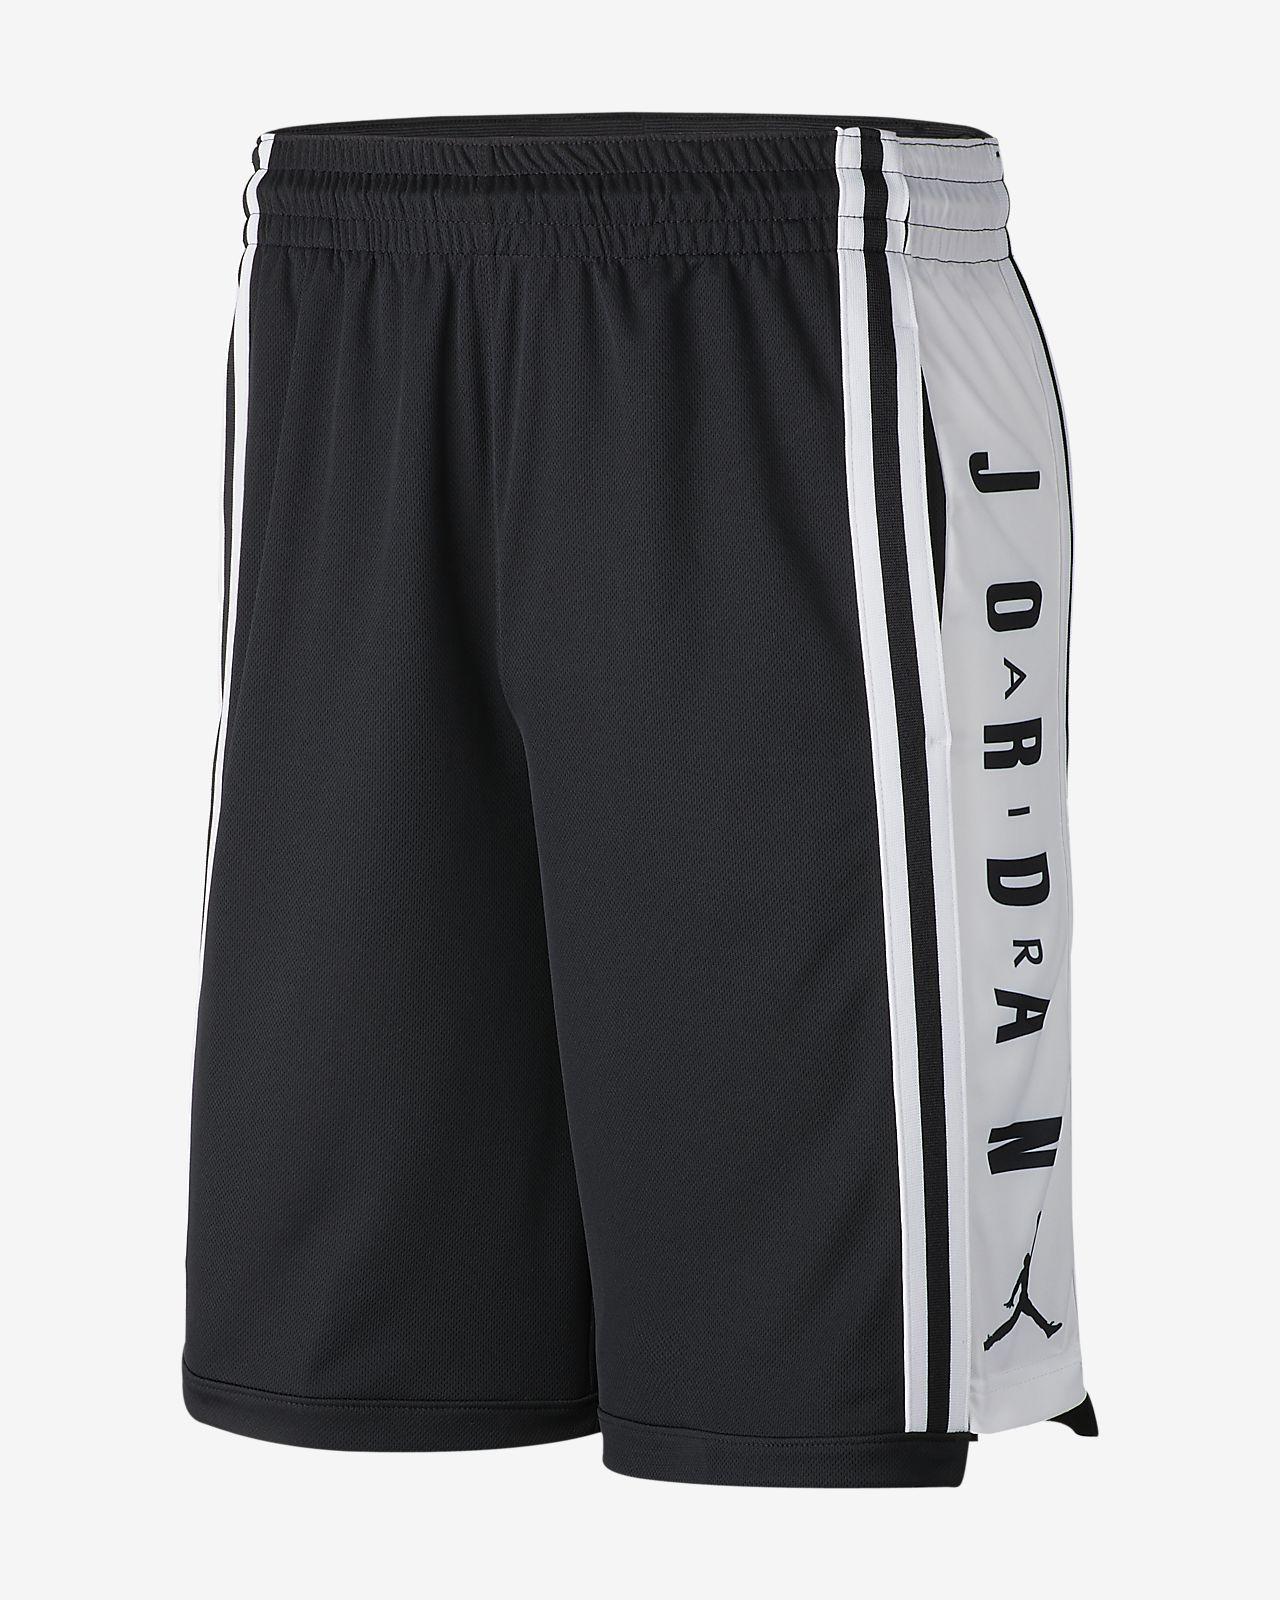 Homme Short Pour Jordan De Basketball f6yIY7vmbg